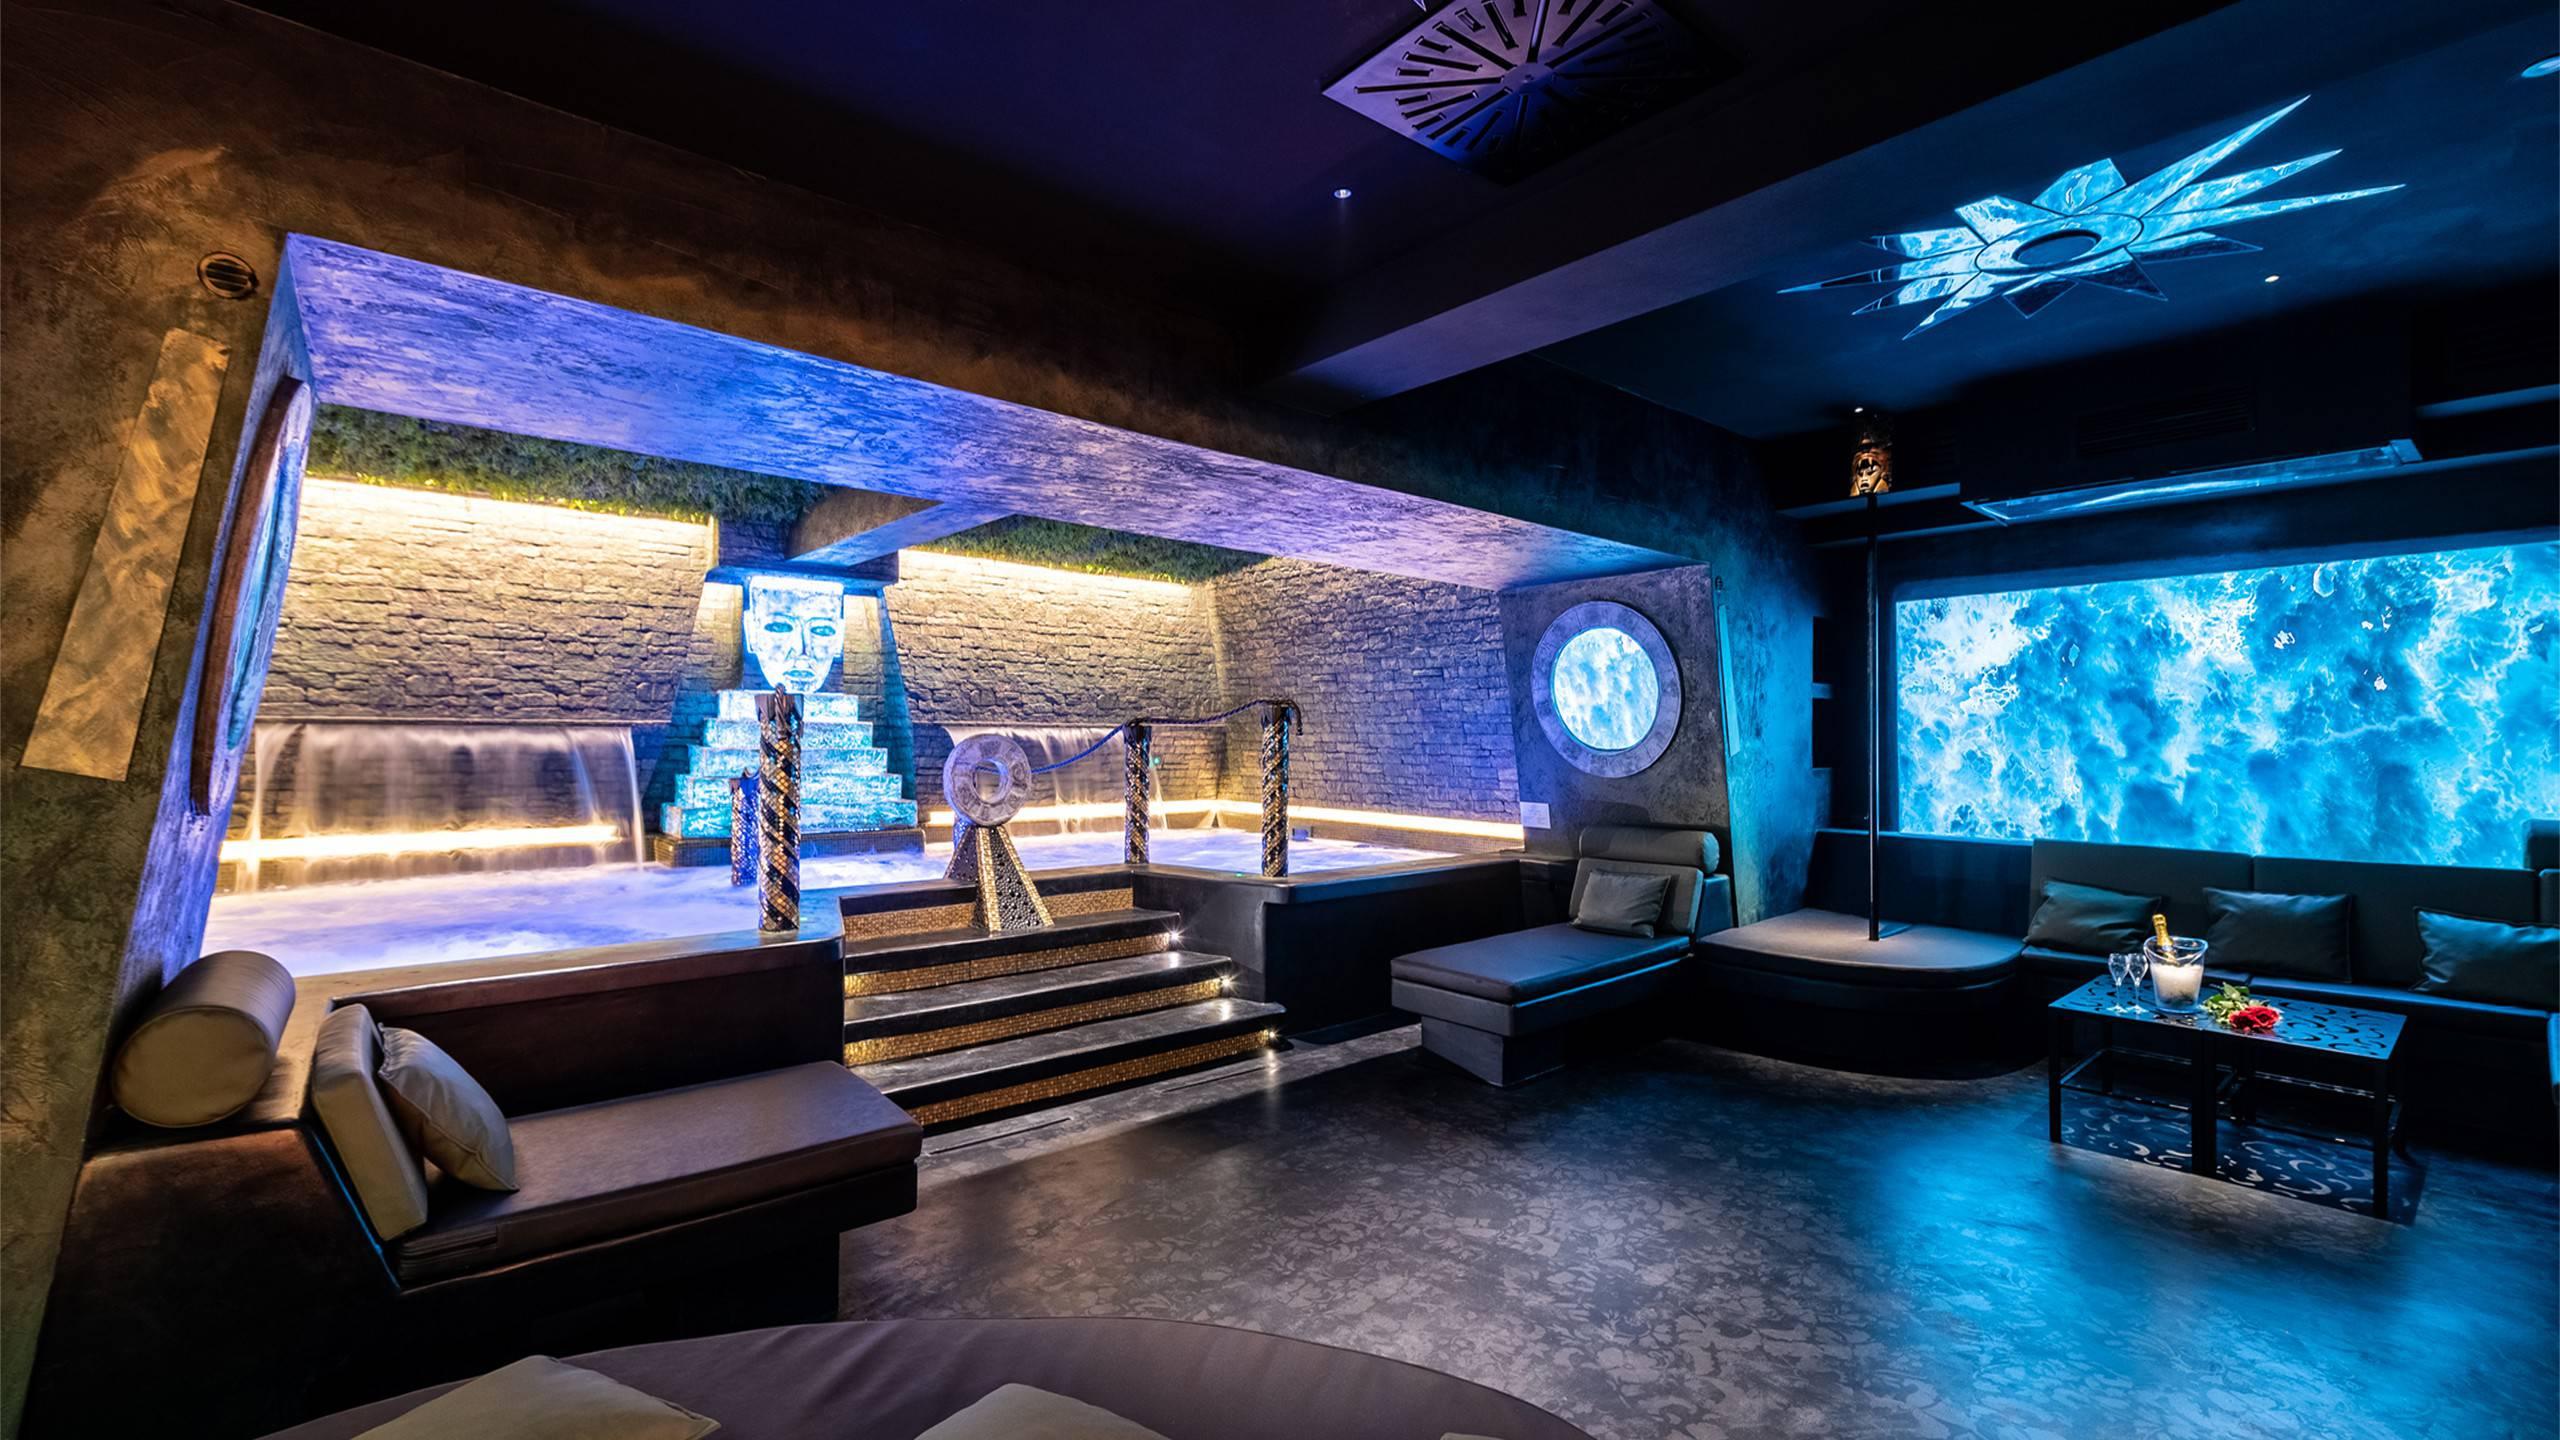 Hotel-Trilussa-Palace-spa-maya-6190-HDR